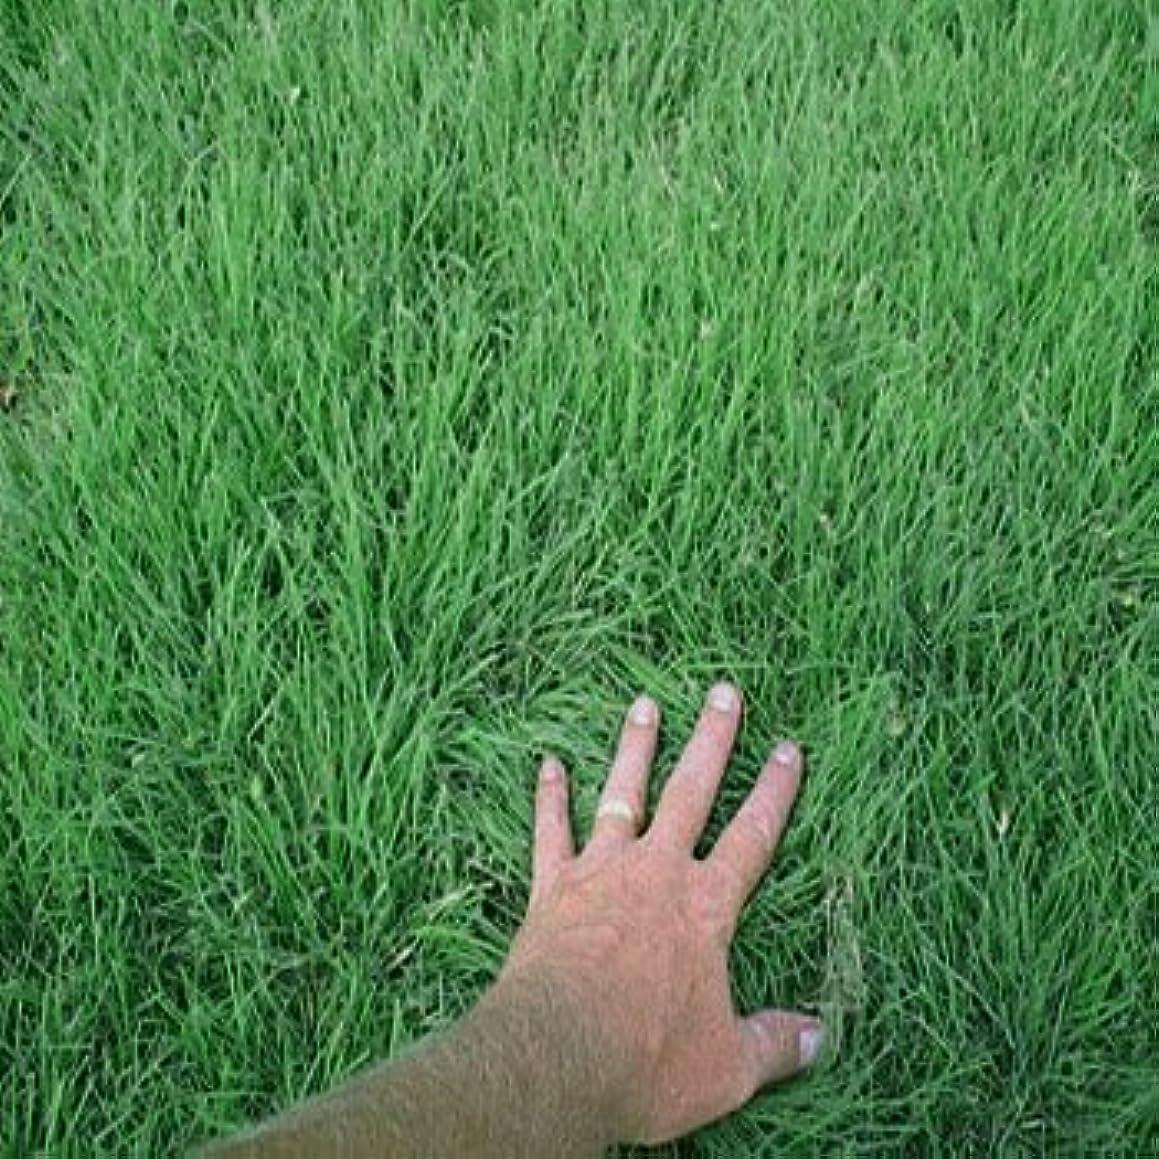 Outsidepride Drought Tolerant Buffalo Lawn Grass Seed - 2 LB